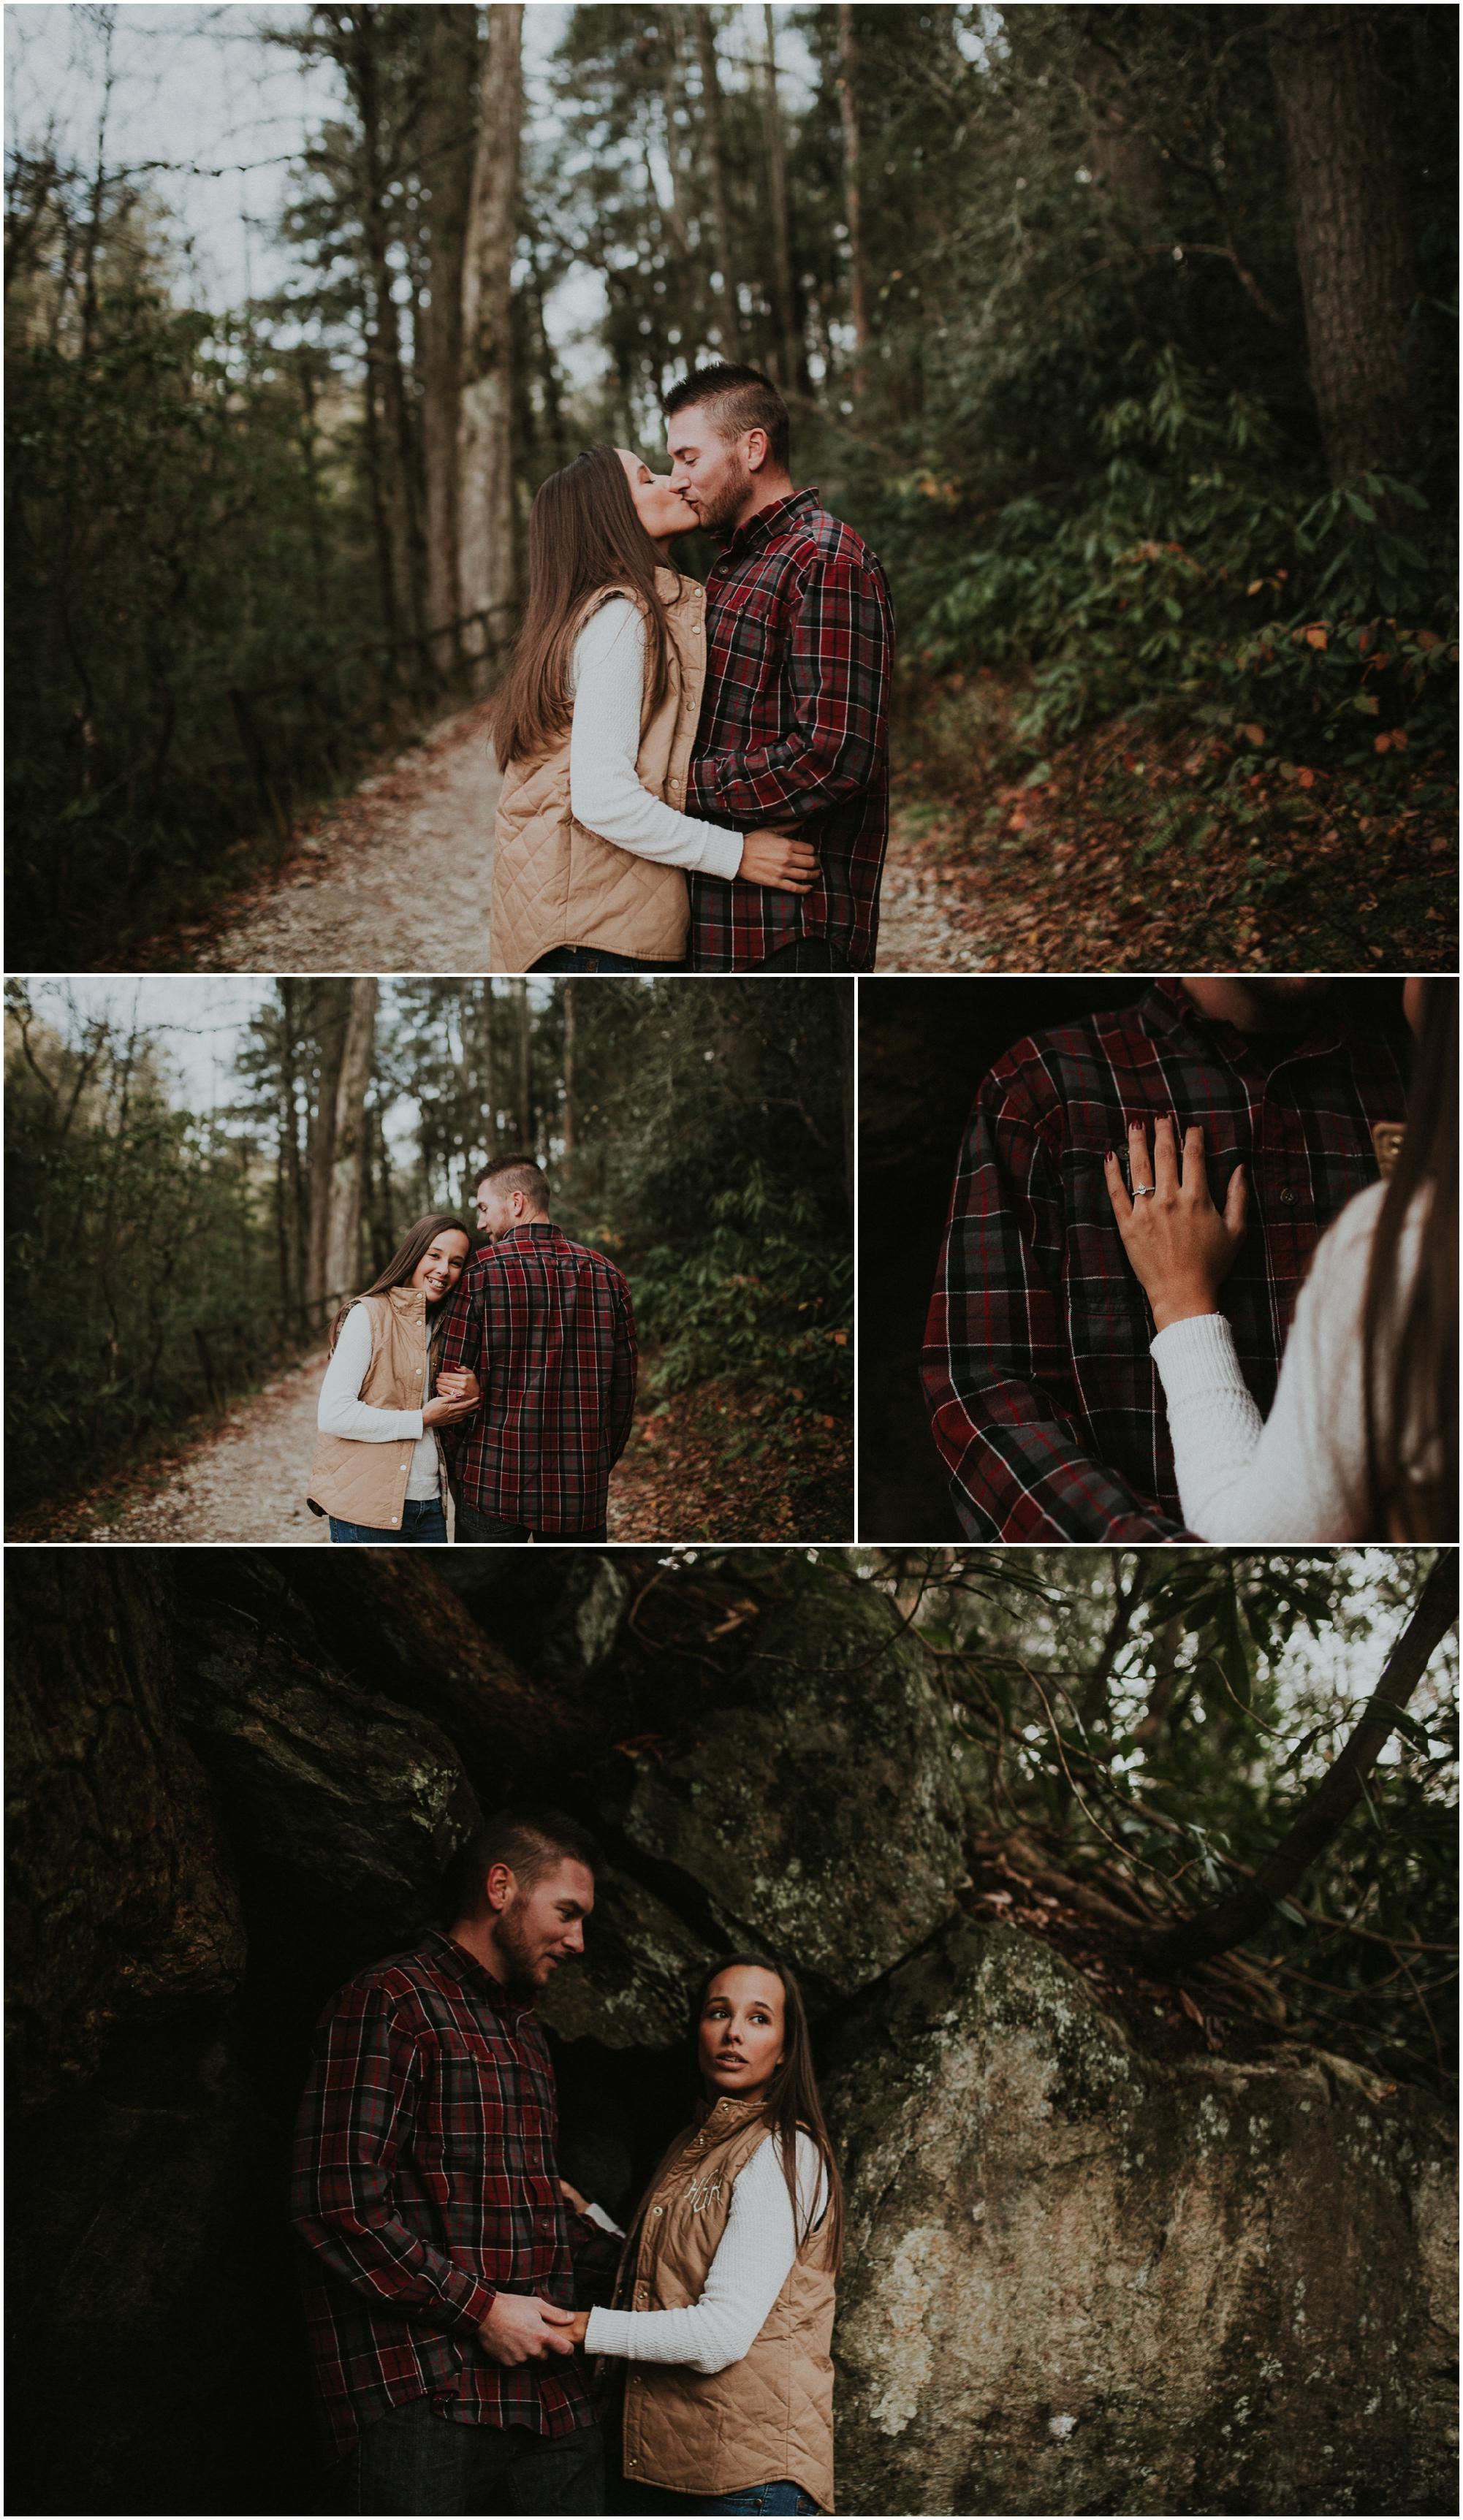 Linville-Falls-Engagement-avonne-Photography-23.jpg